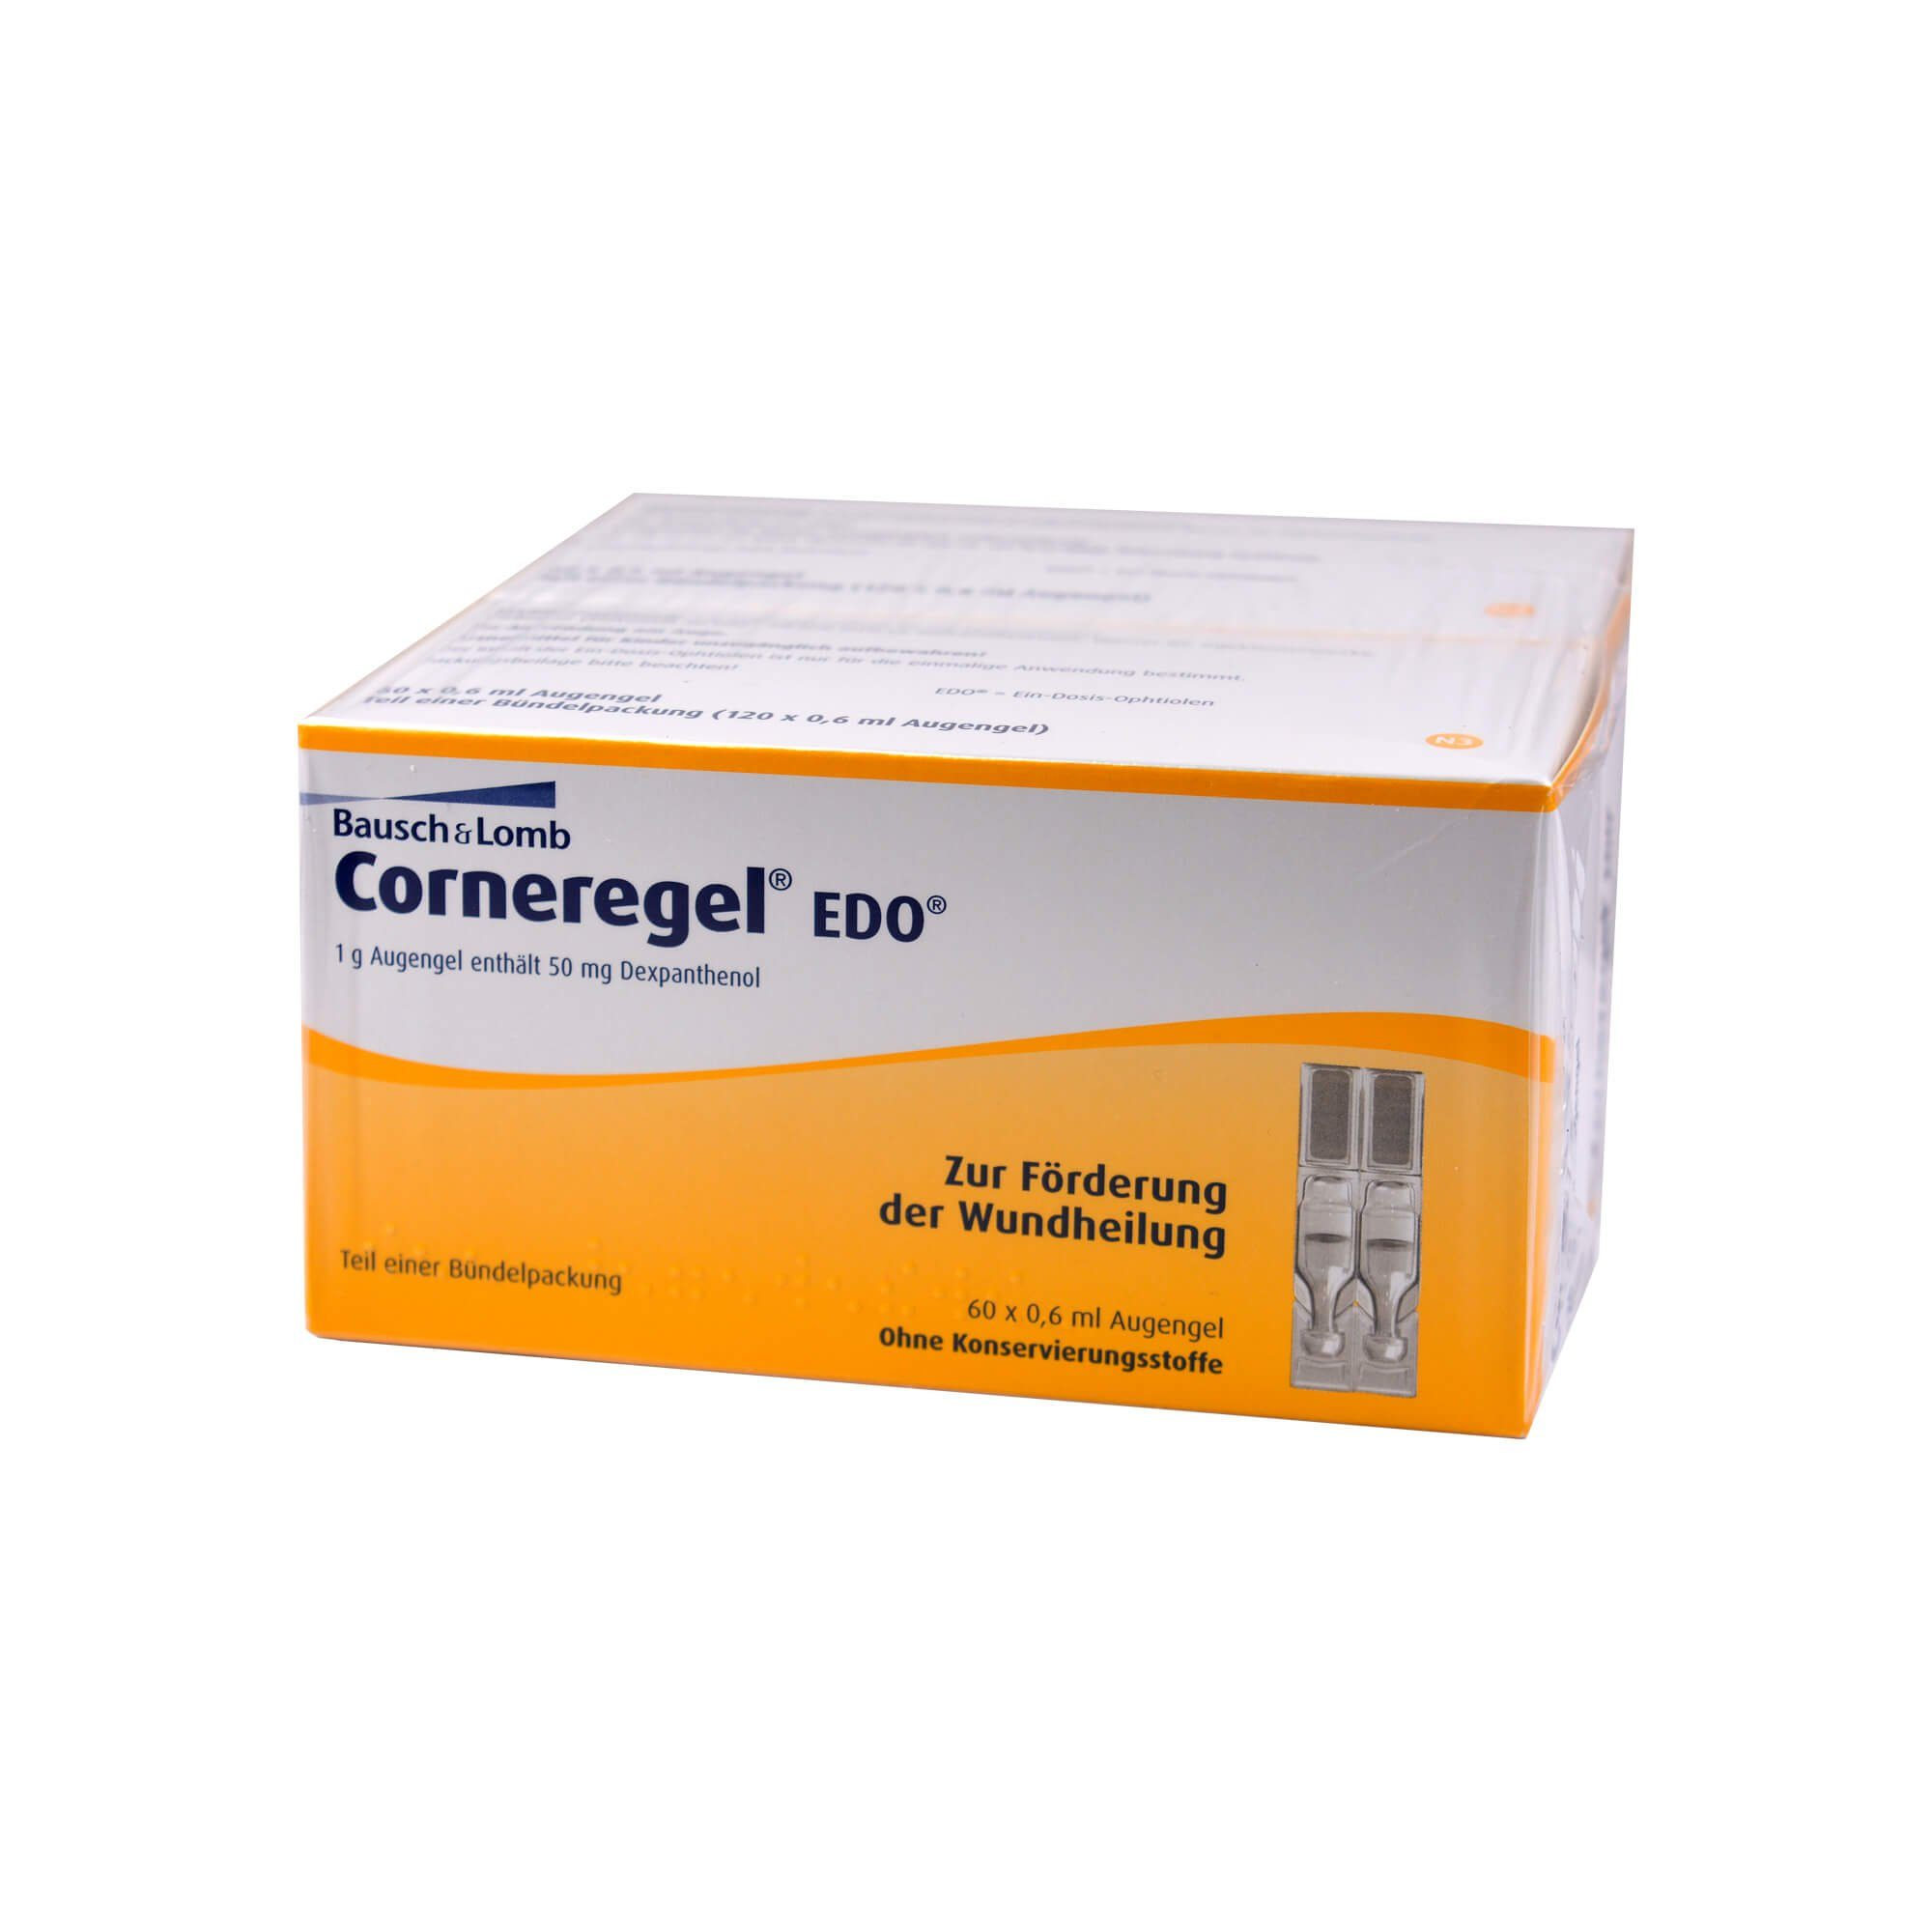 Corneregel EDO Augengel, 120X0.6 ml